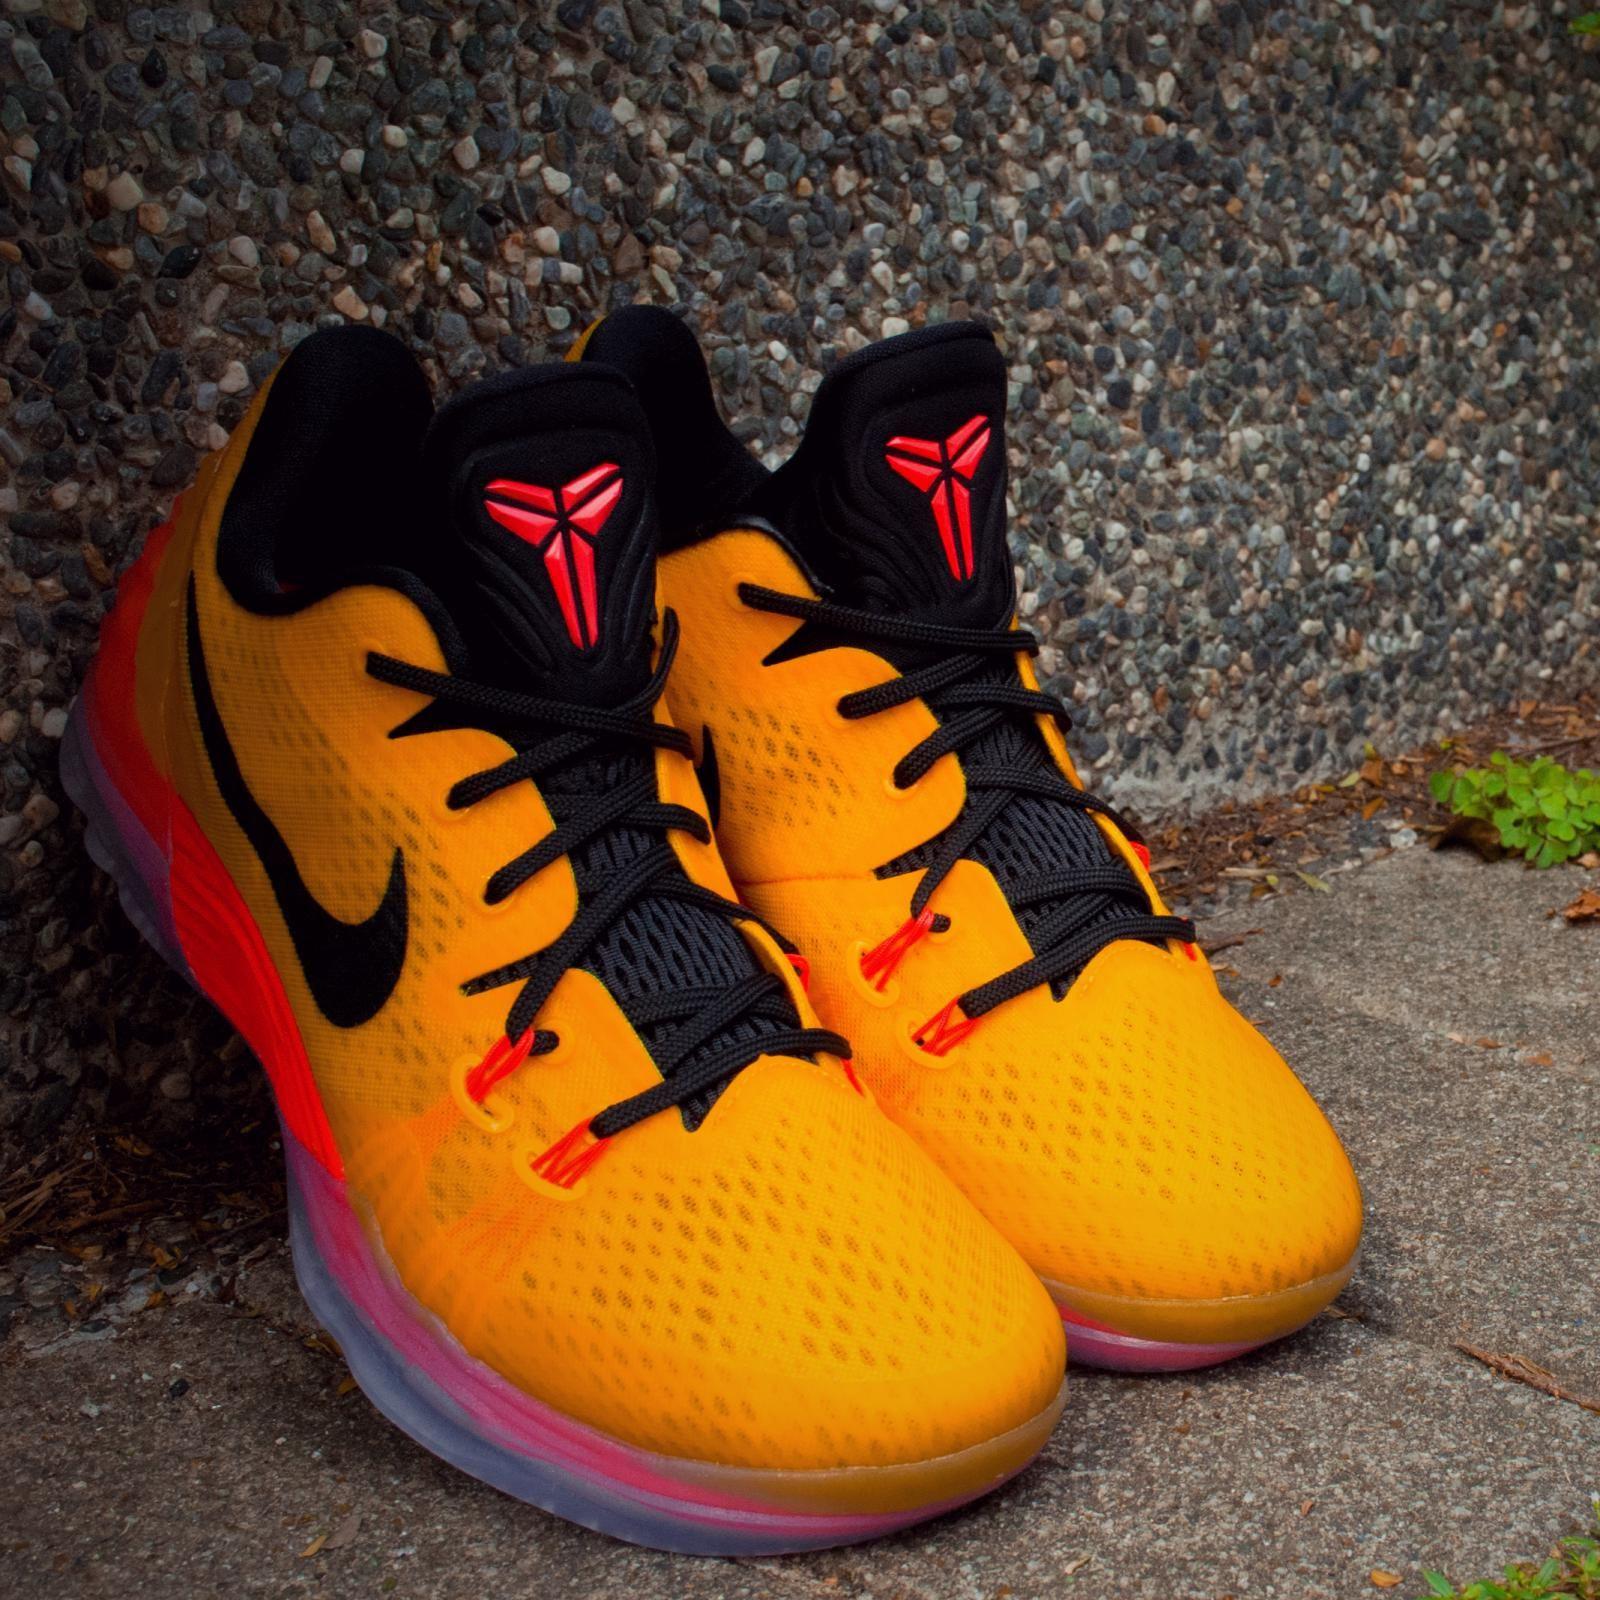 cross trainer sneakers nike cheap nike basketball shoes